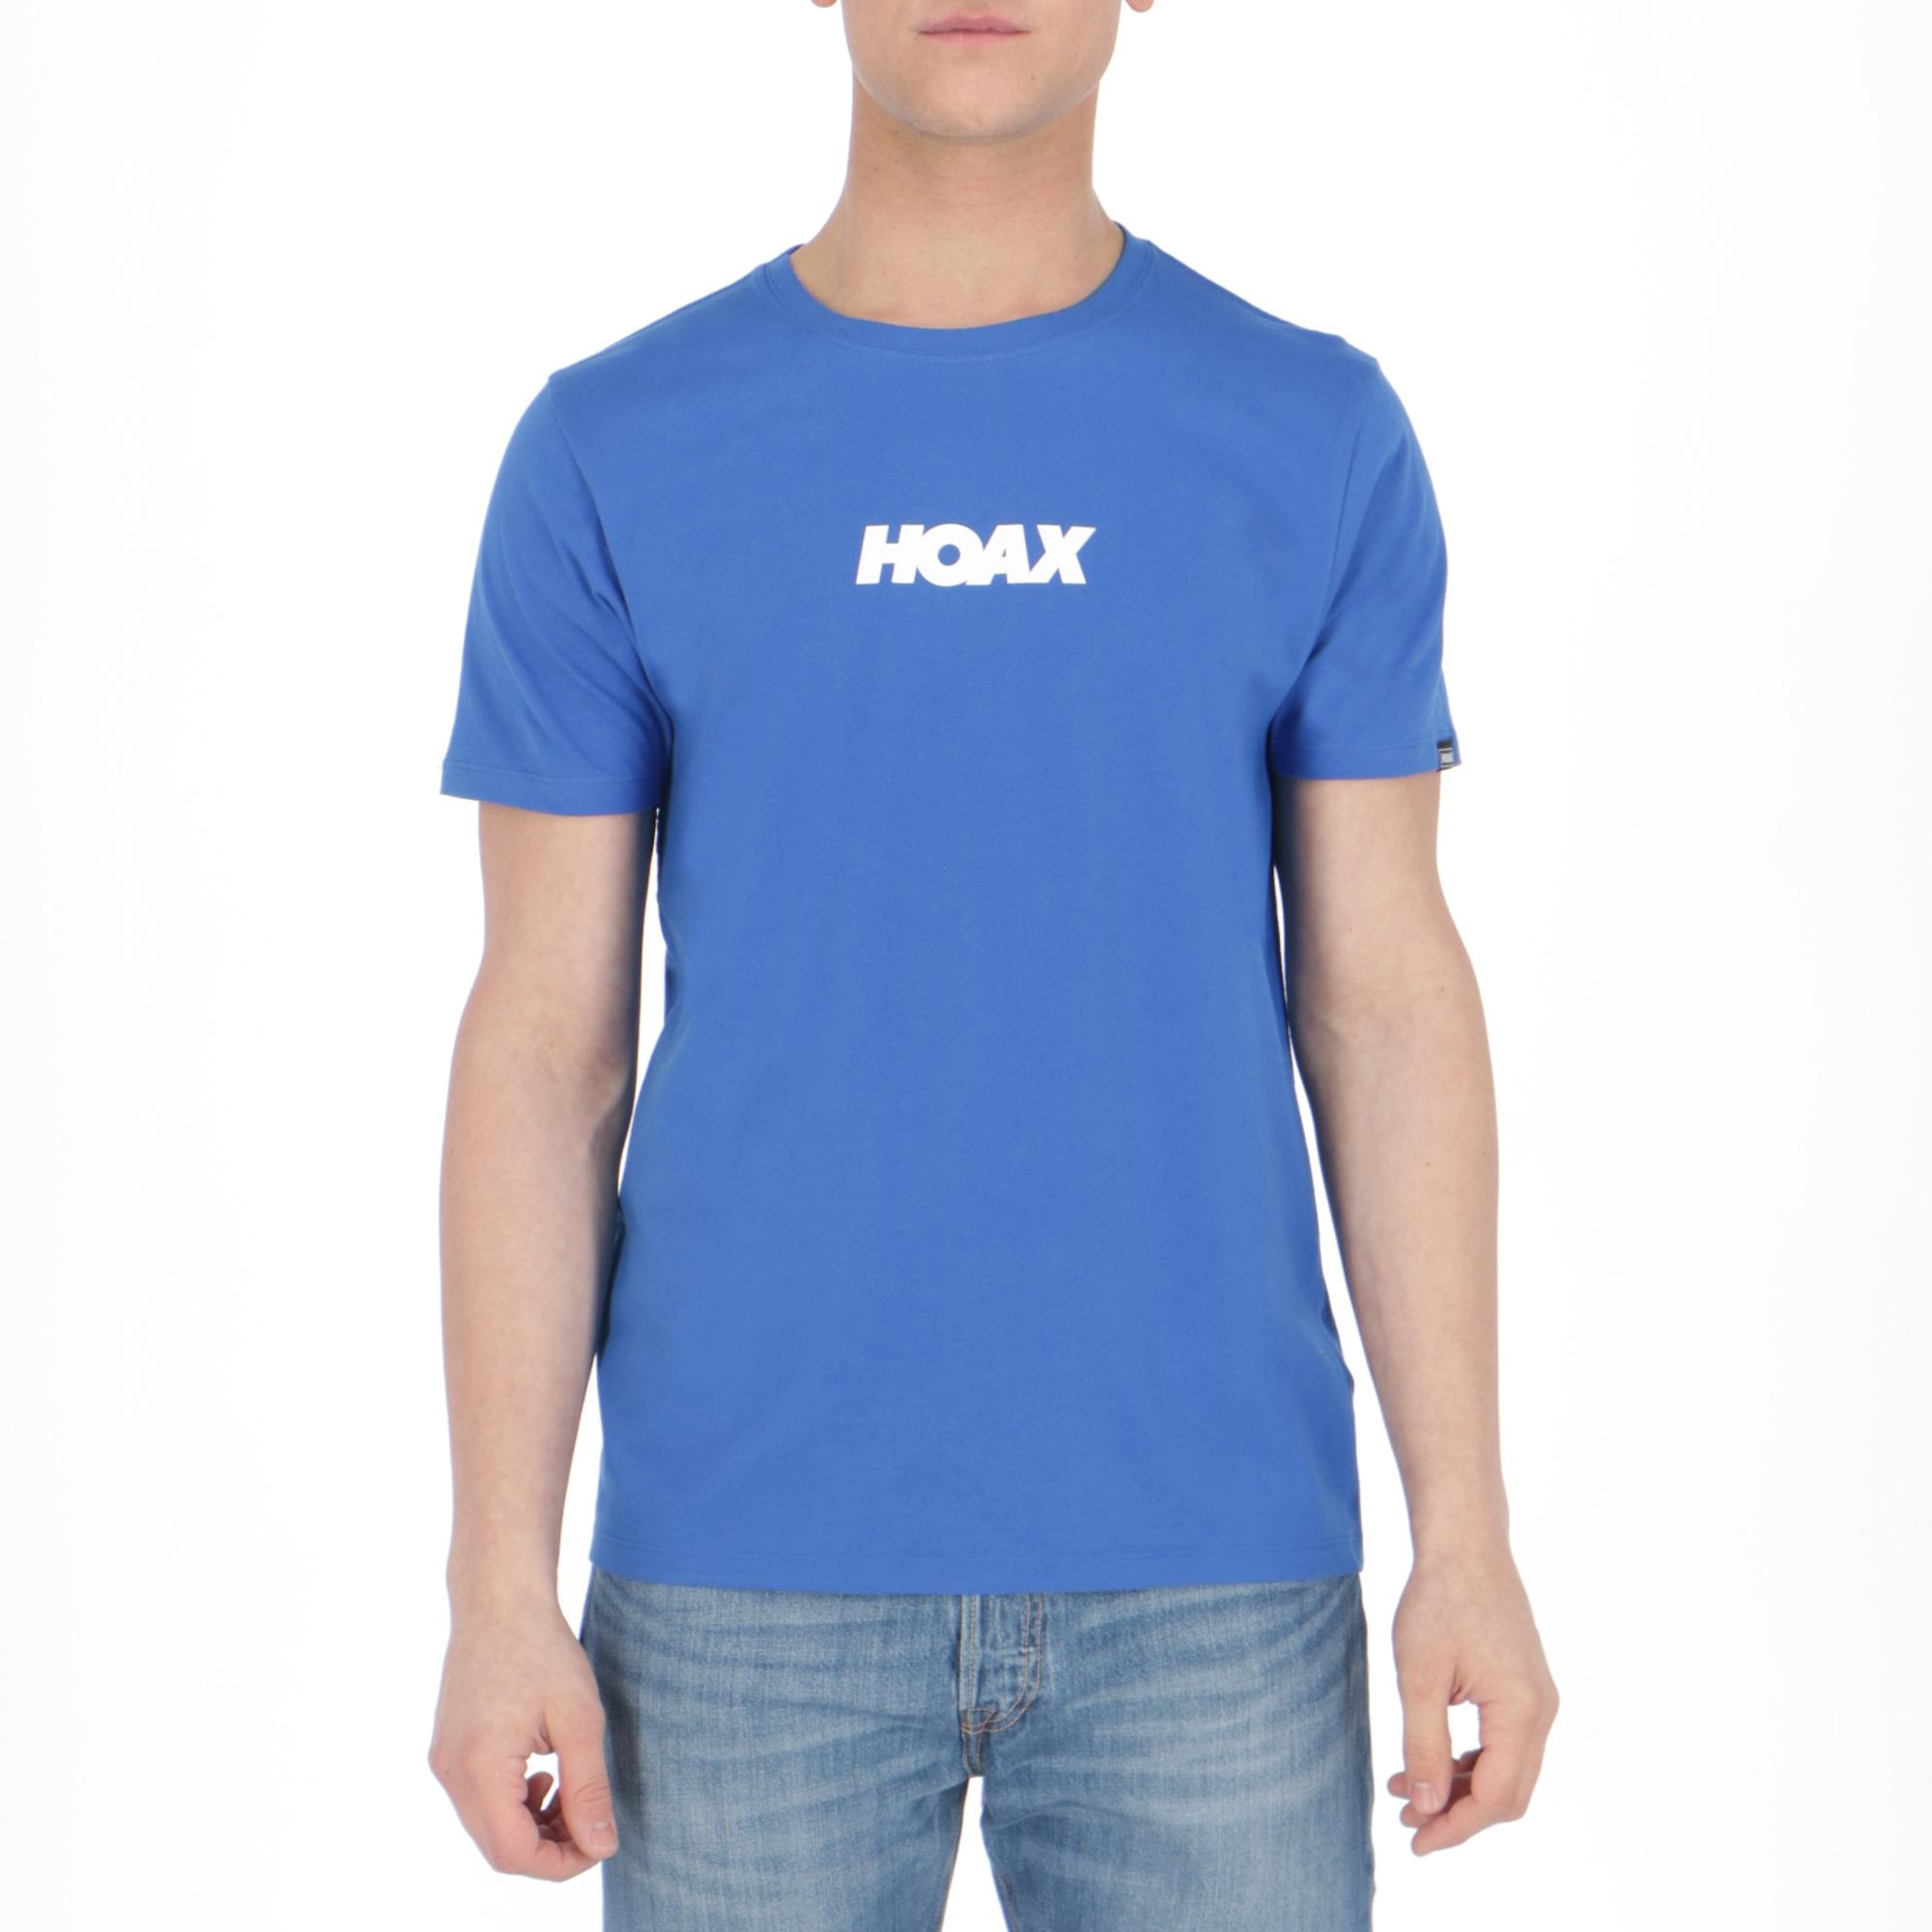 Hoax Pulse Tee Blue